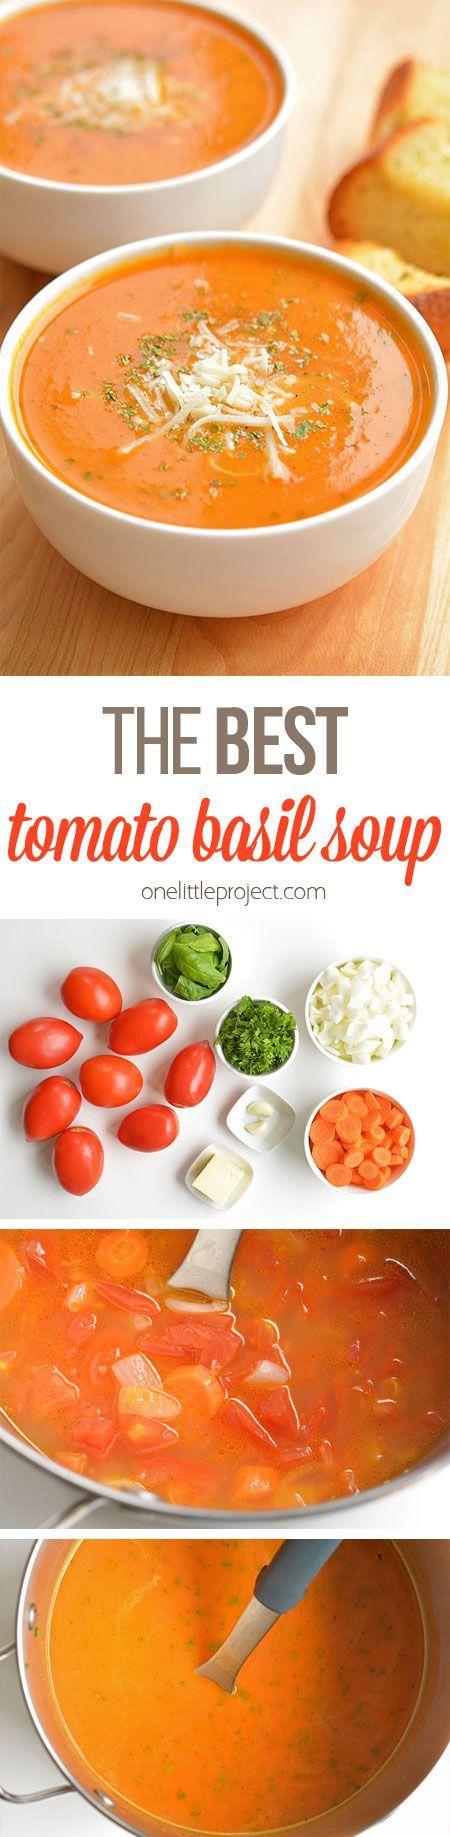 Delicious tomato basil soup!